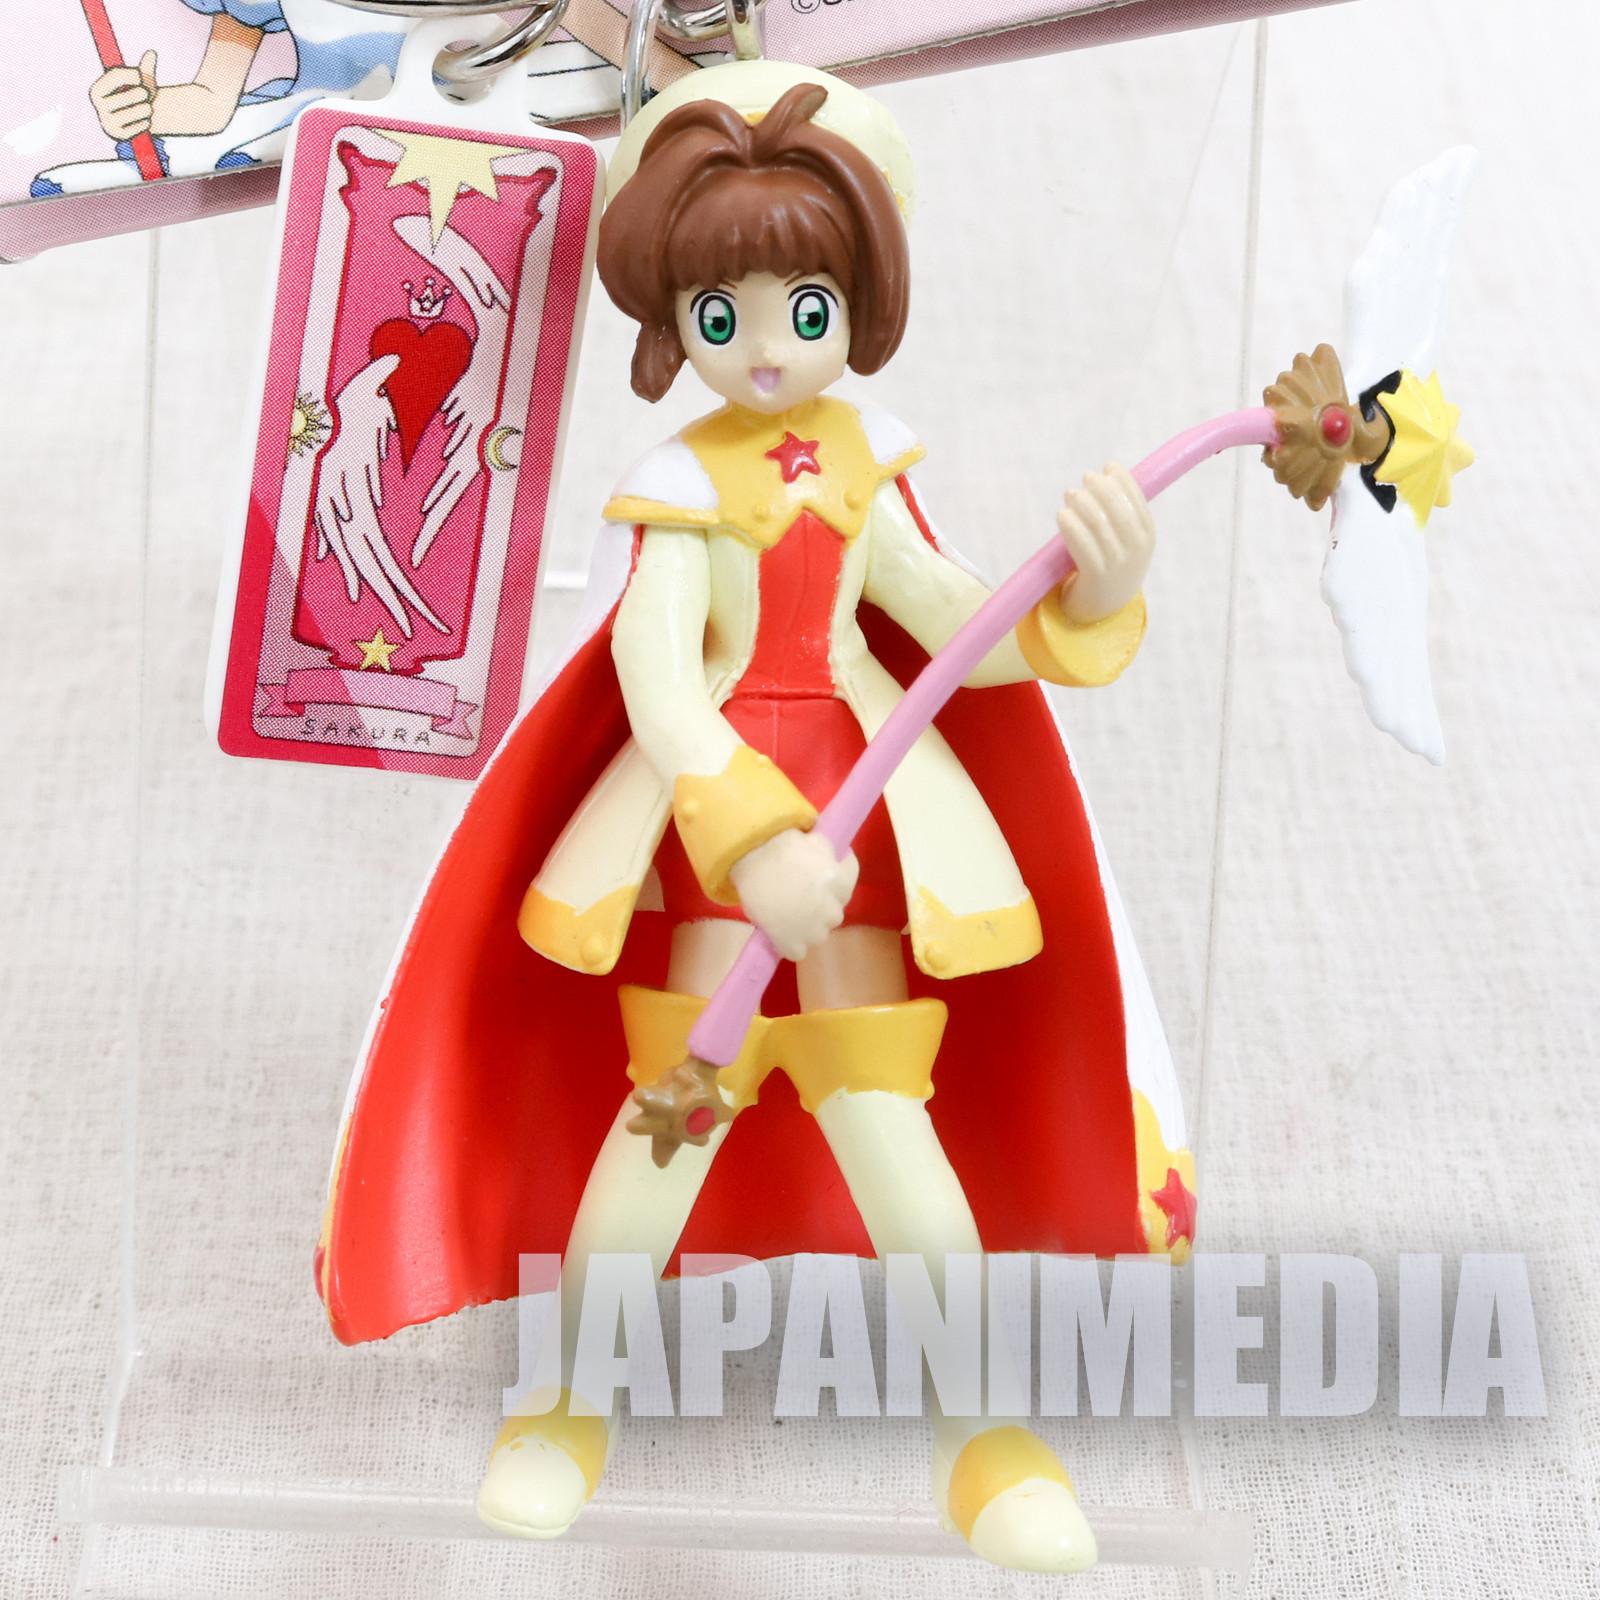 Cardcaptor Sakura Figure Keychain Battle Uniform Ver. 2 JAPAN ANIME MANGA CLAMP